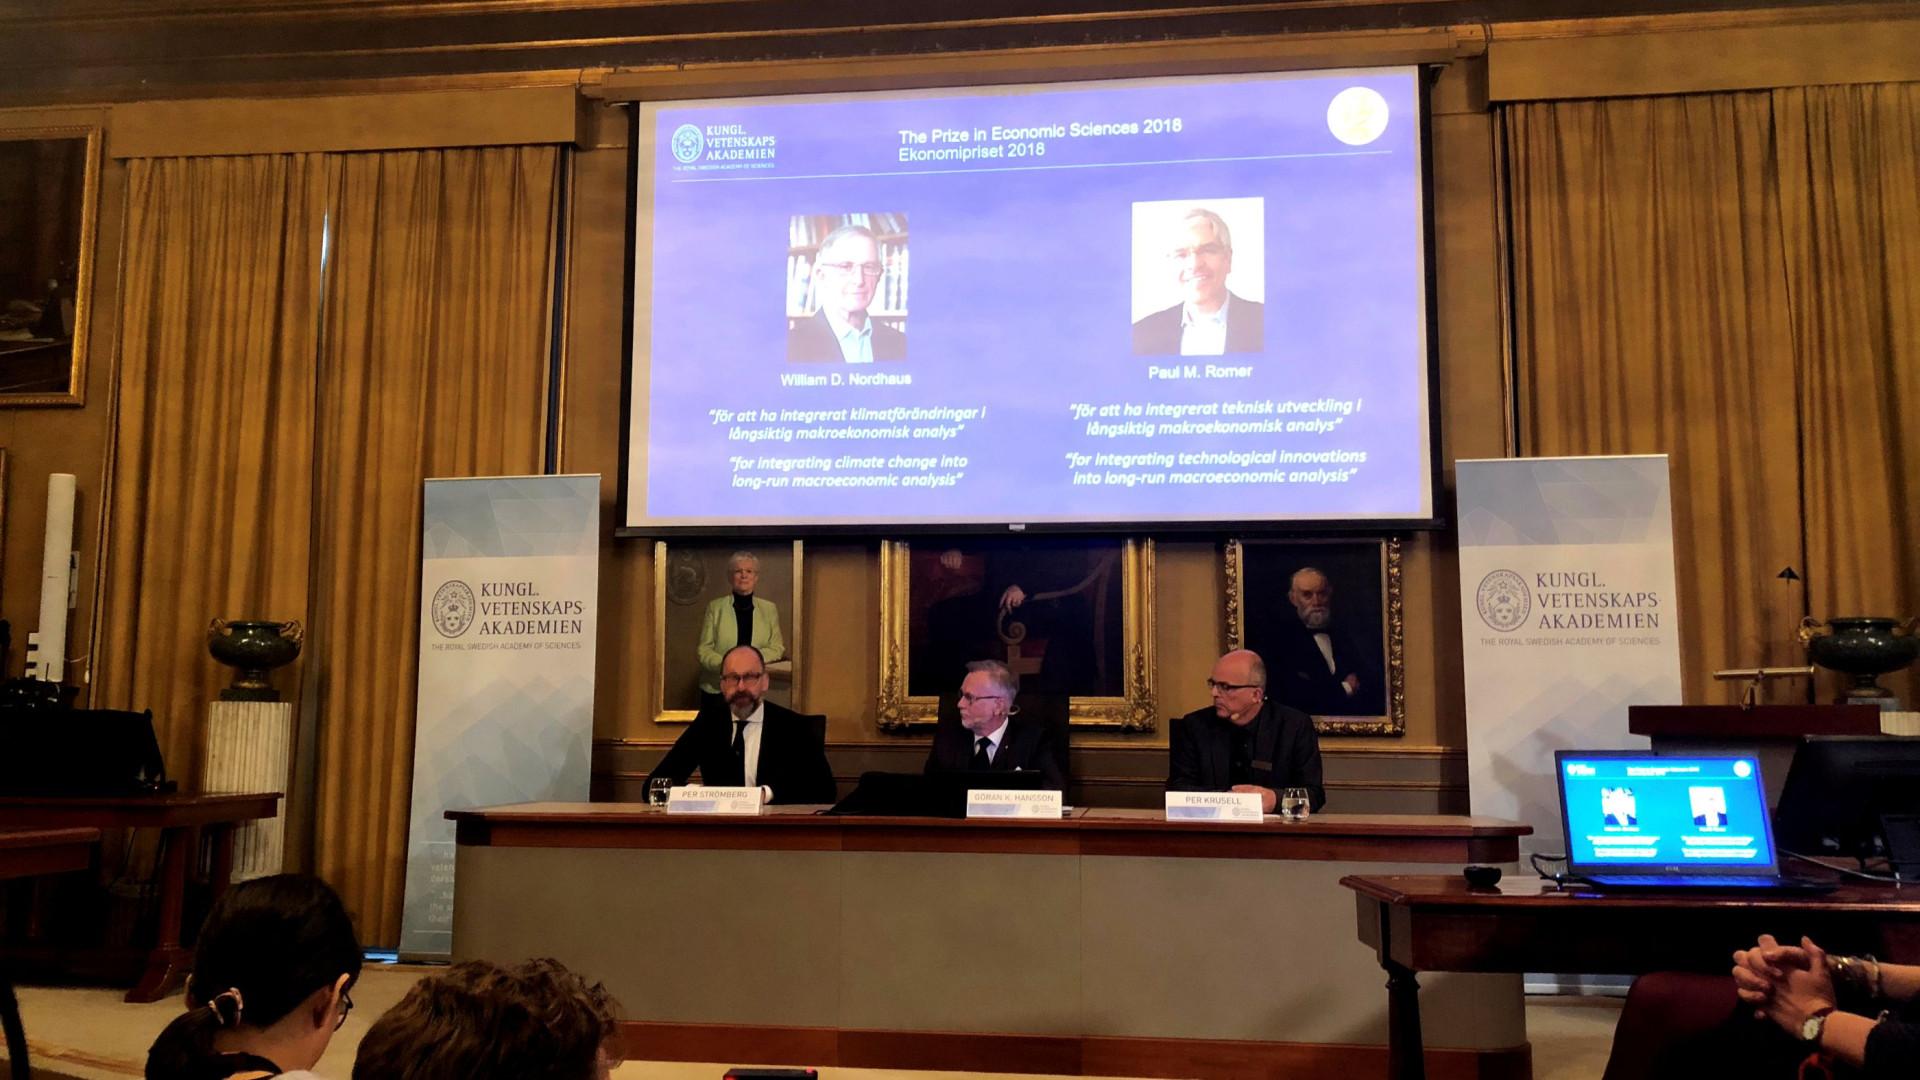 Prémio Nobel da Economia atribuído a William D. Nordhaus e Paul Romer